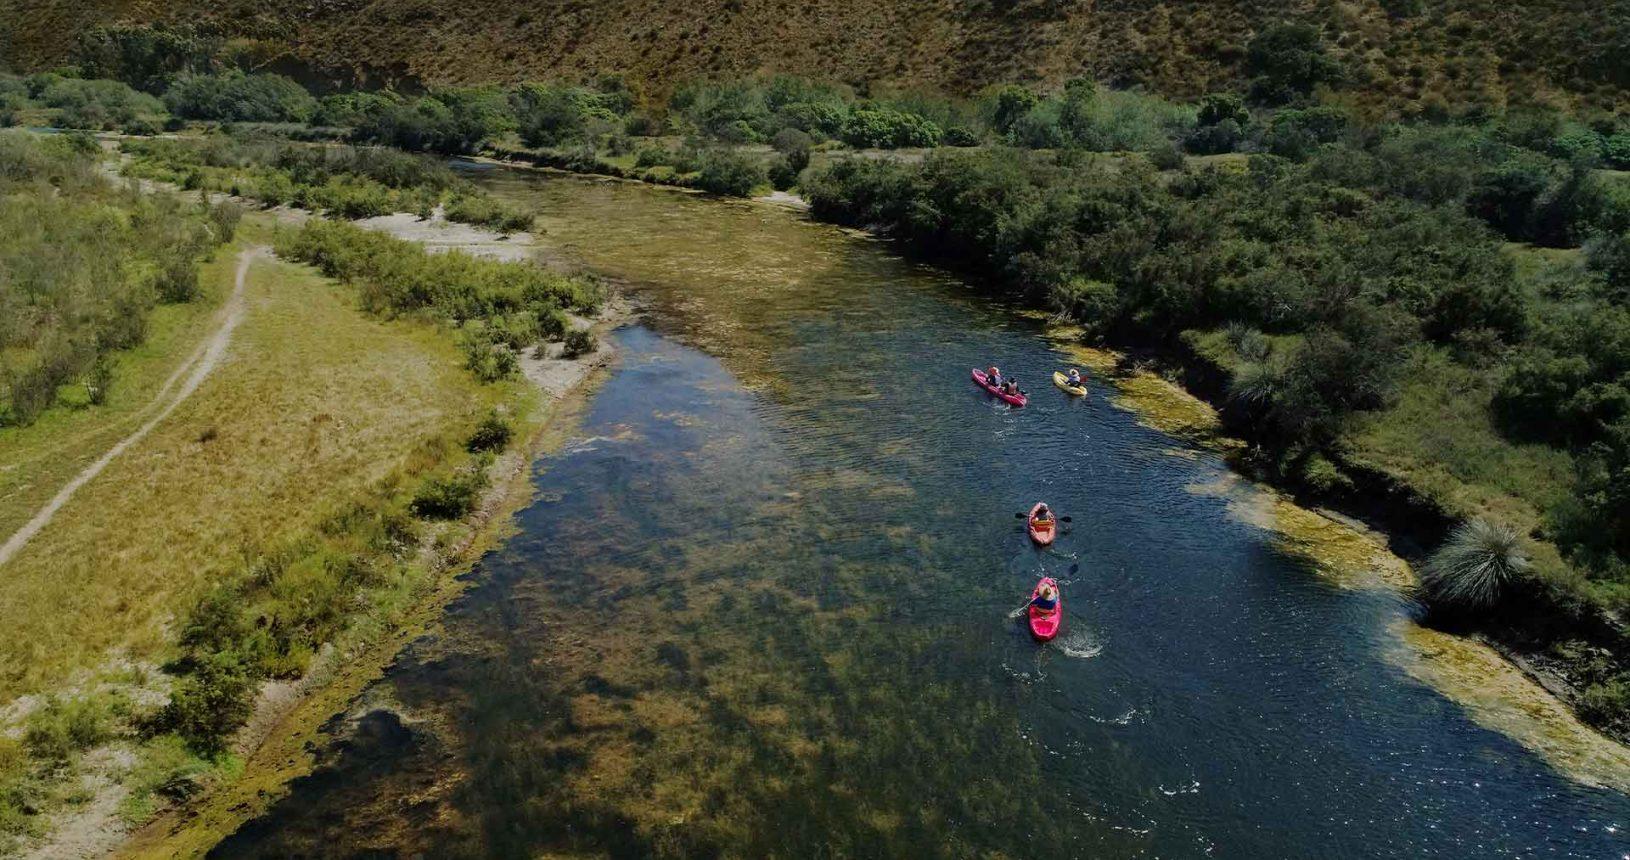 rosarito adventure baja california